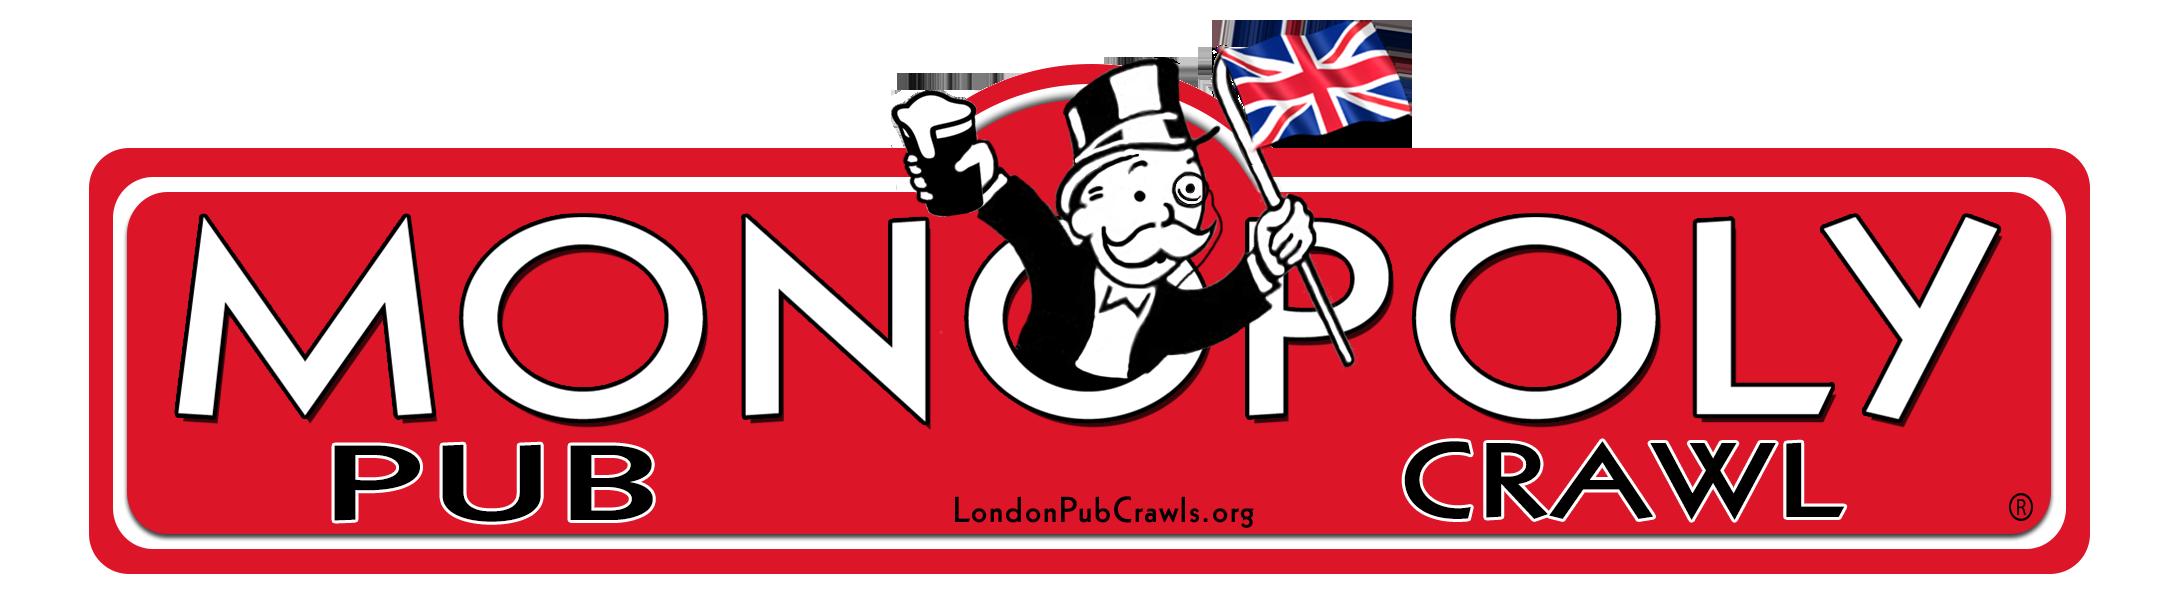 monopoly-pub-crawl-header